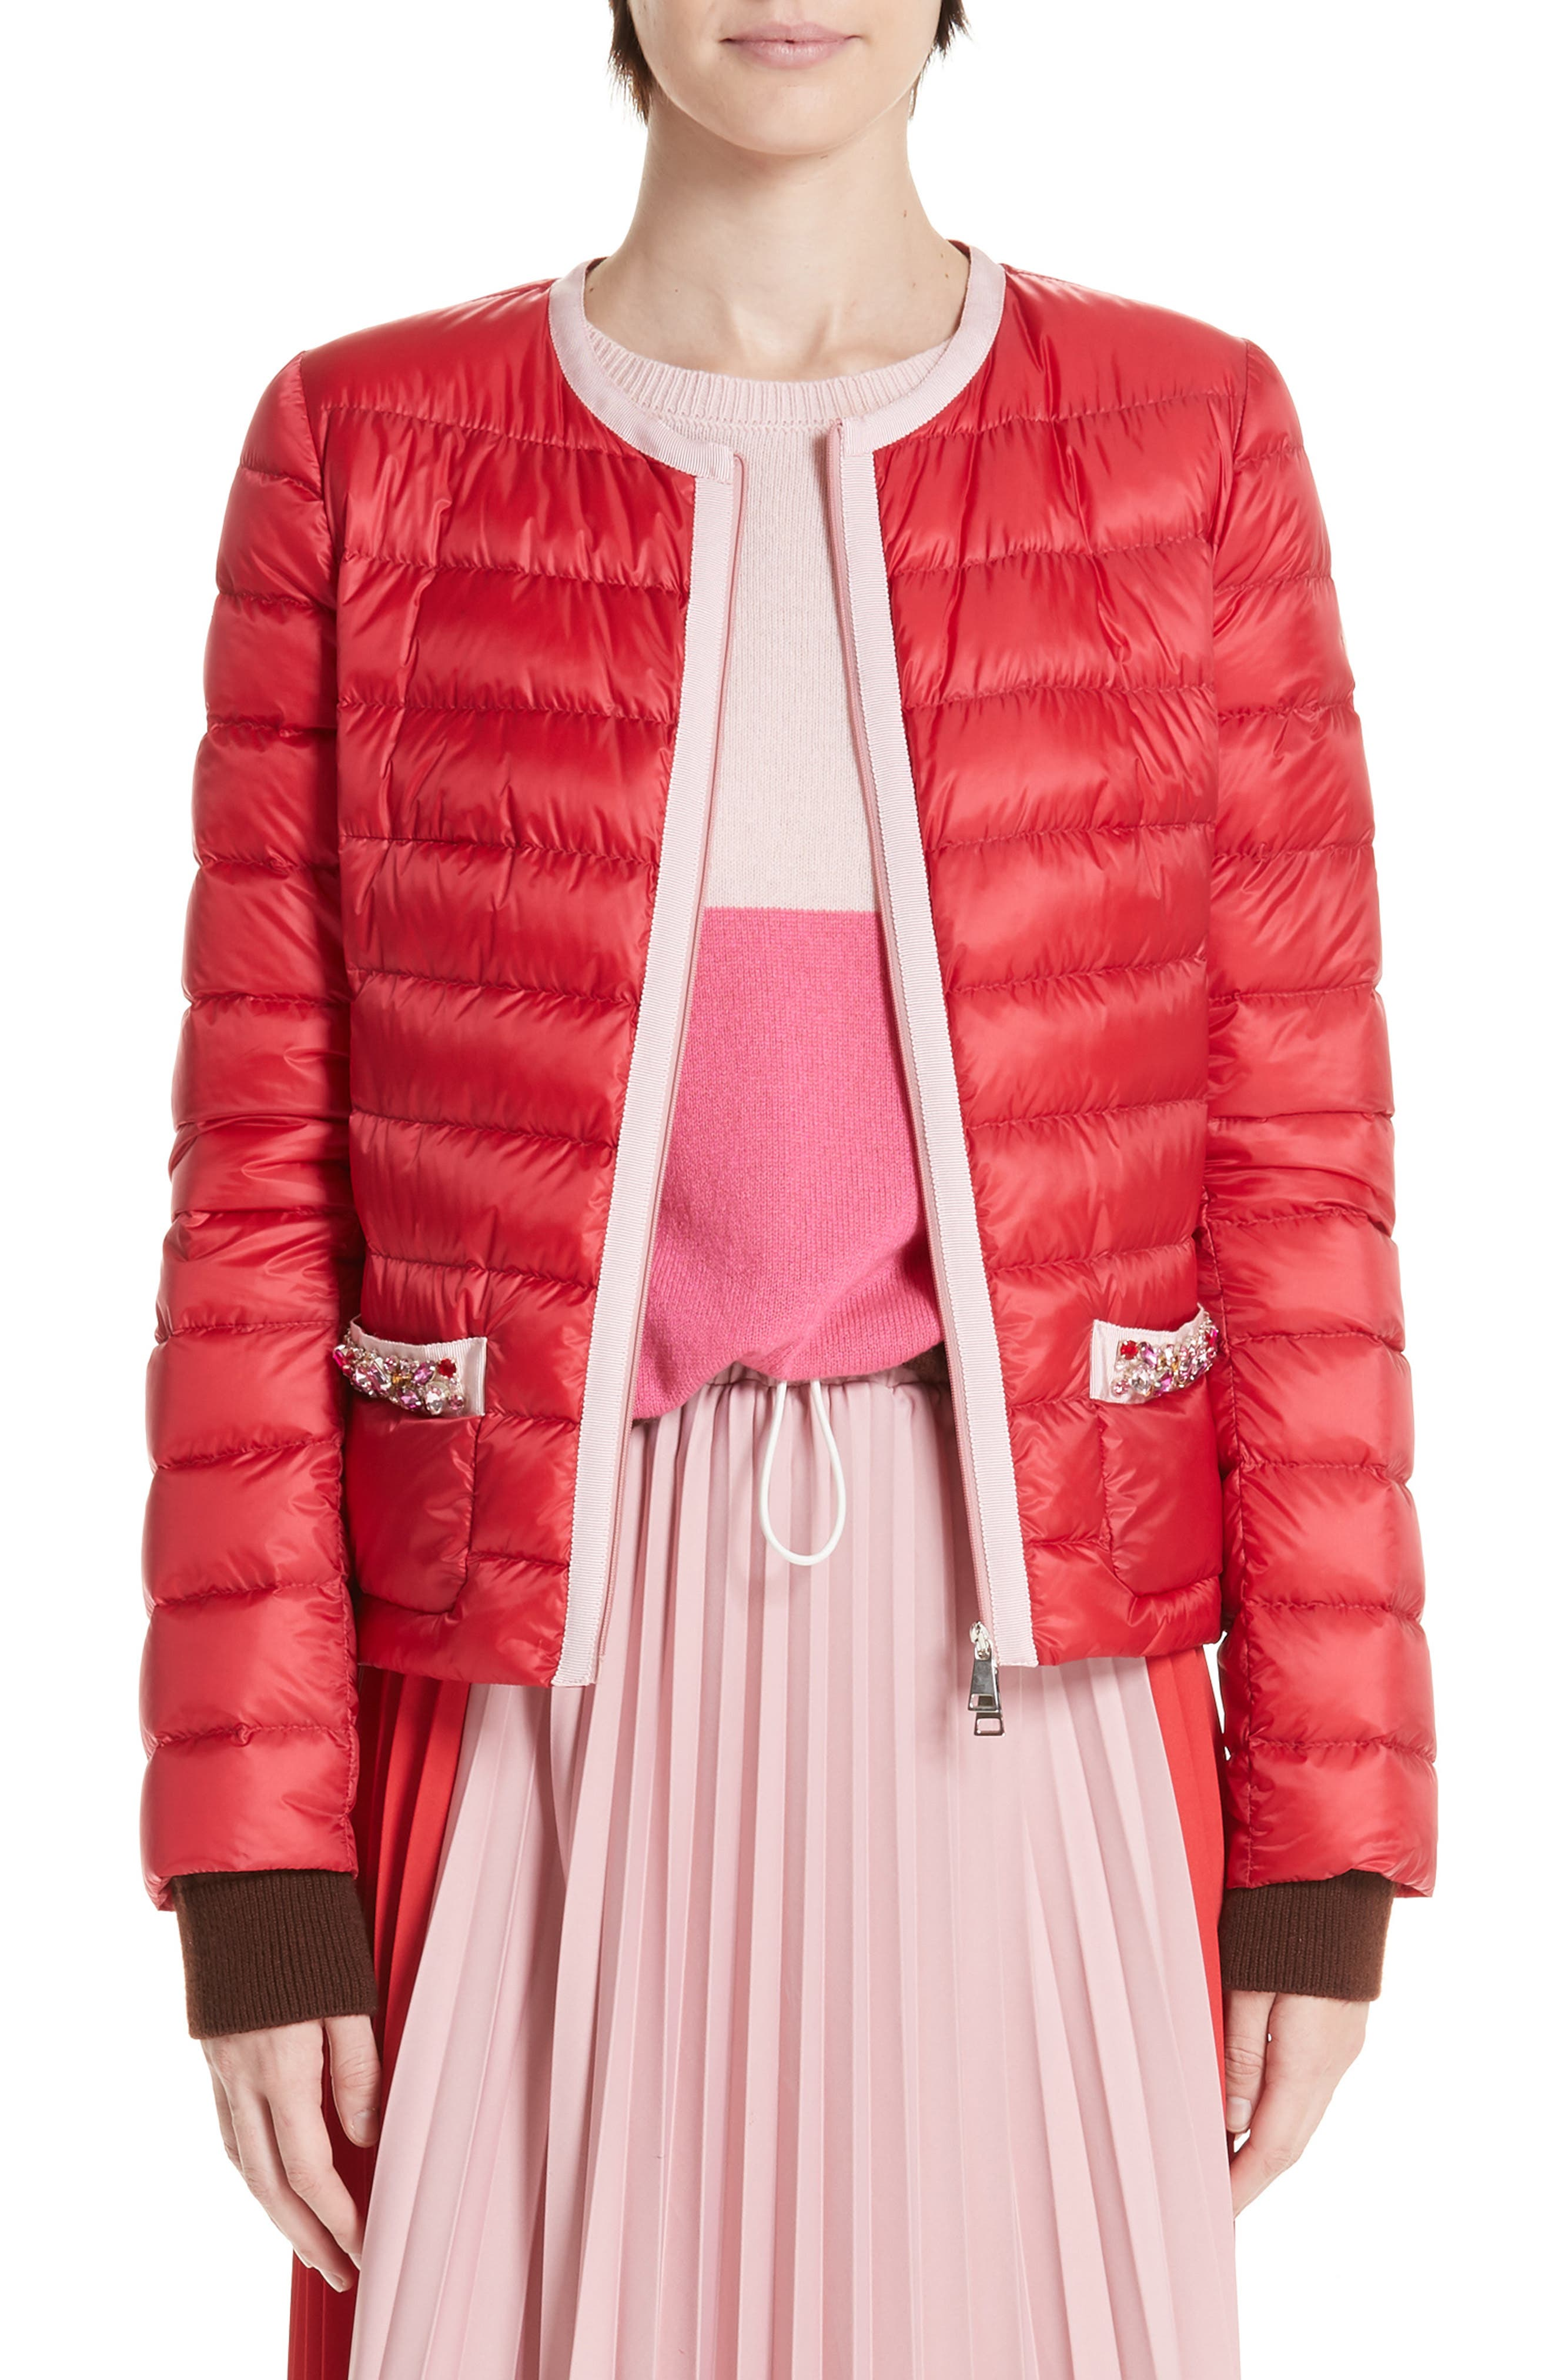 MONCLER, Cristalline Jacket, Main thumbnail 1, color, RED